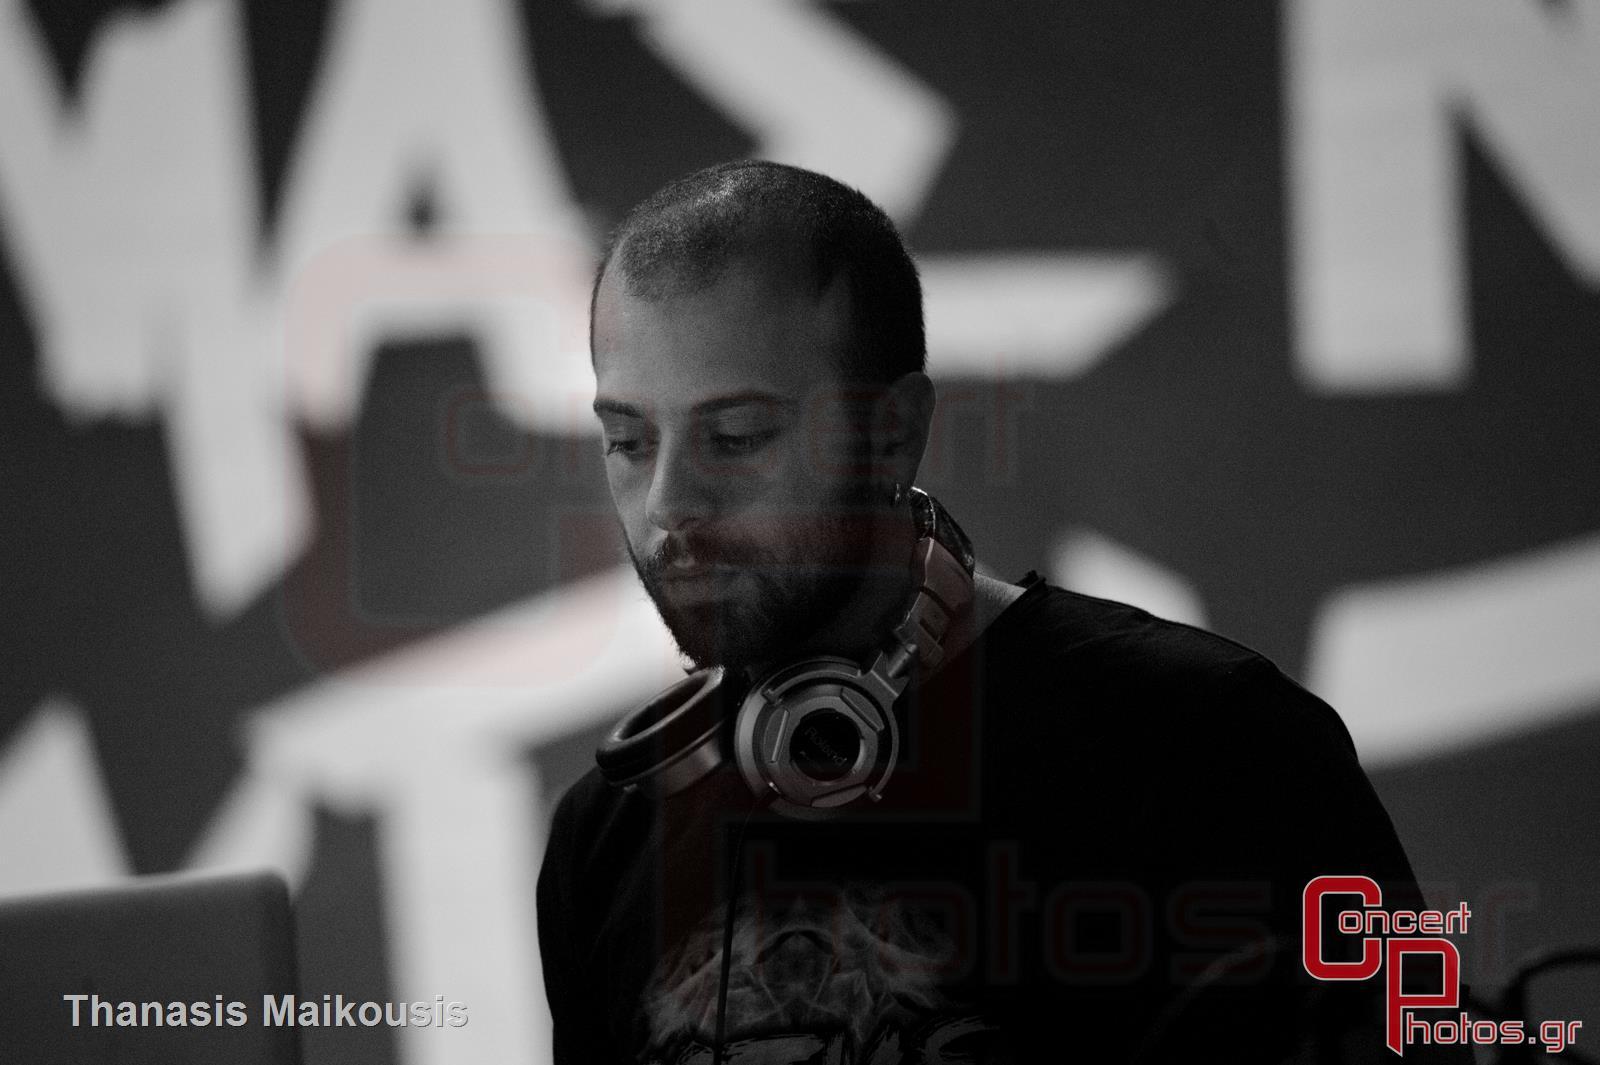 Active Member - Τραγούδα μας να φύγει το σκοτάδι- photographer: Thanasis Maikousis - concertphotos_-4980